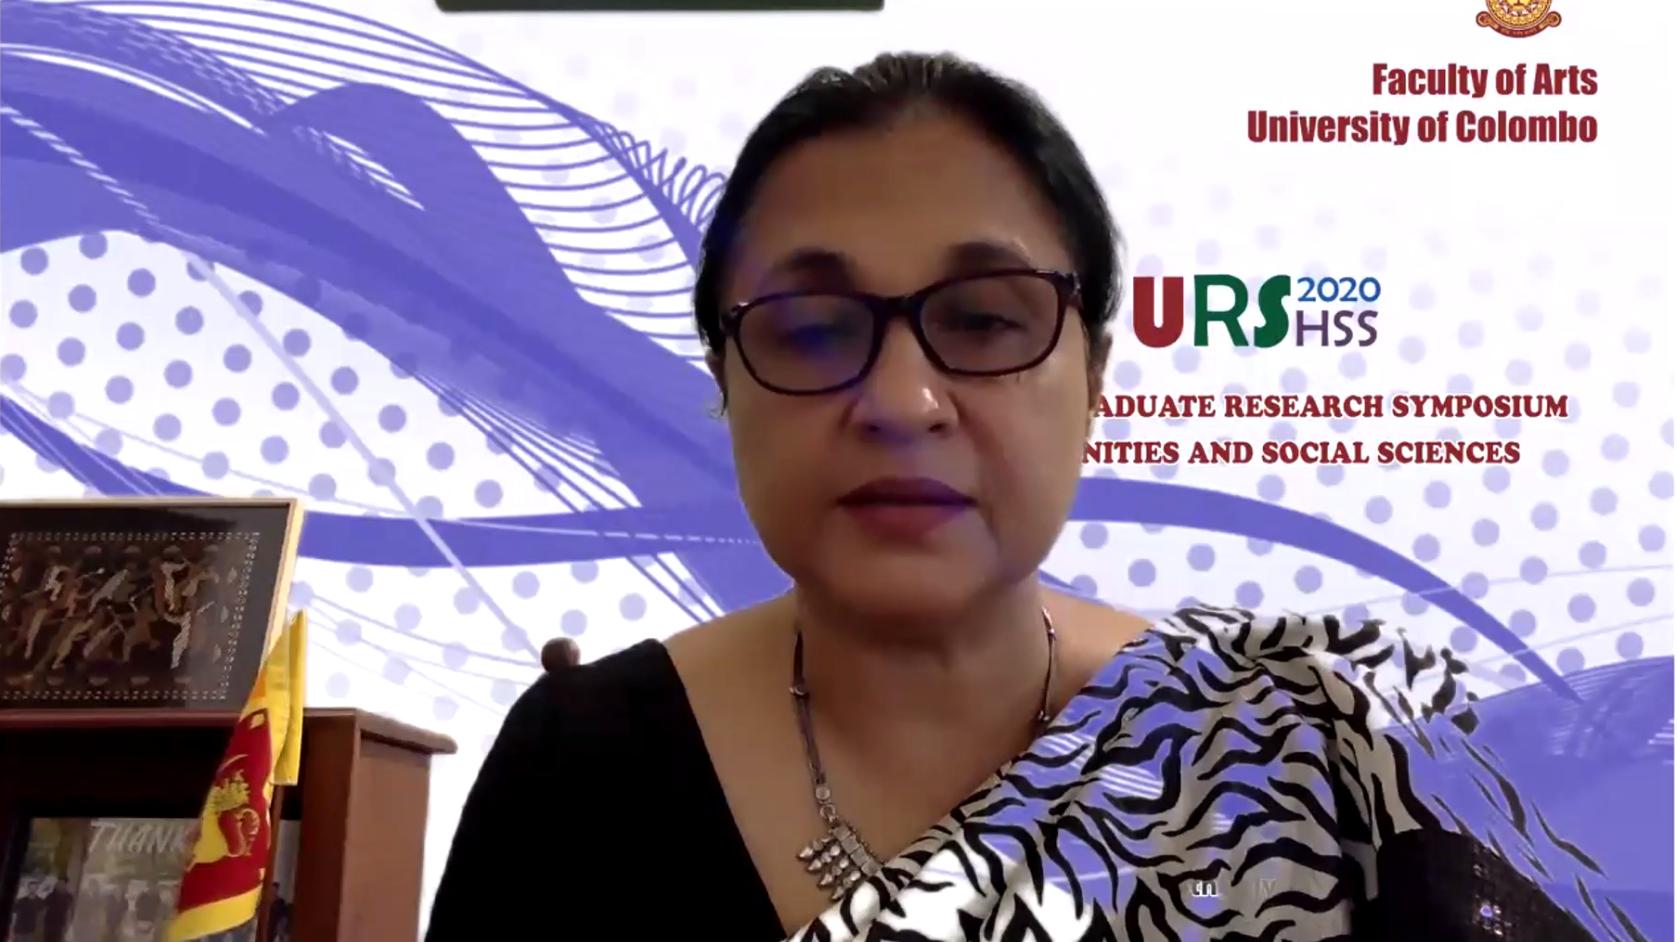 Undergraduate Research Symposium 2020 – 24th July